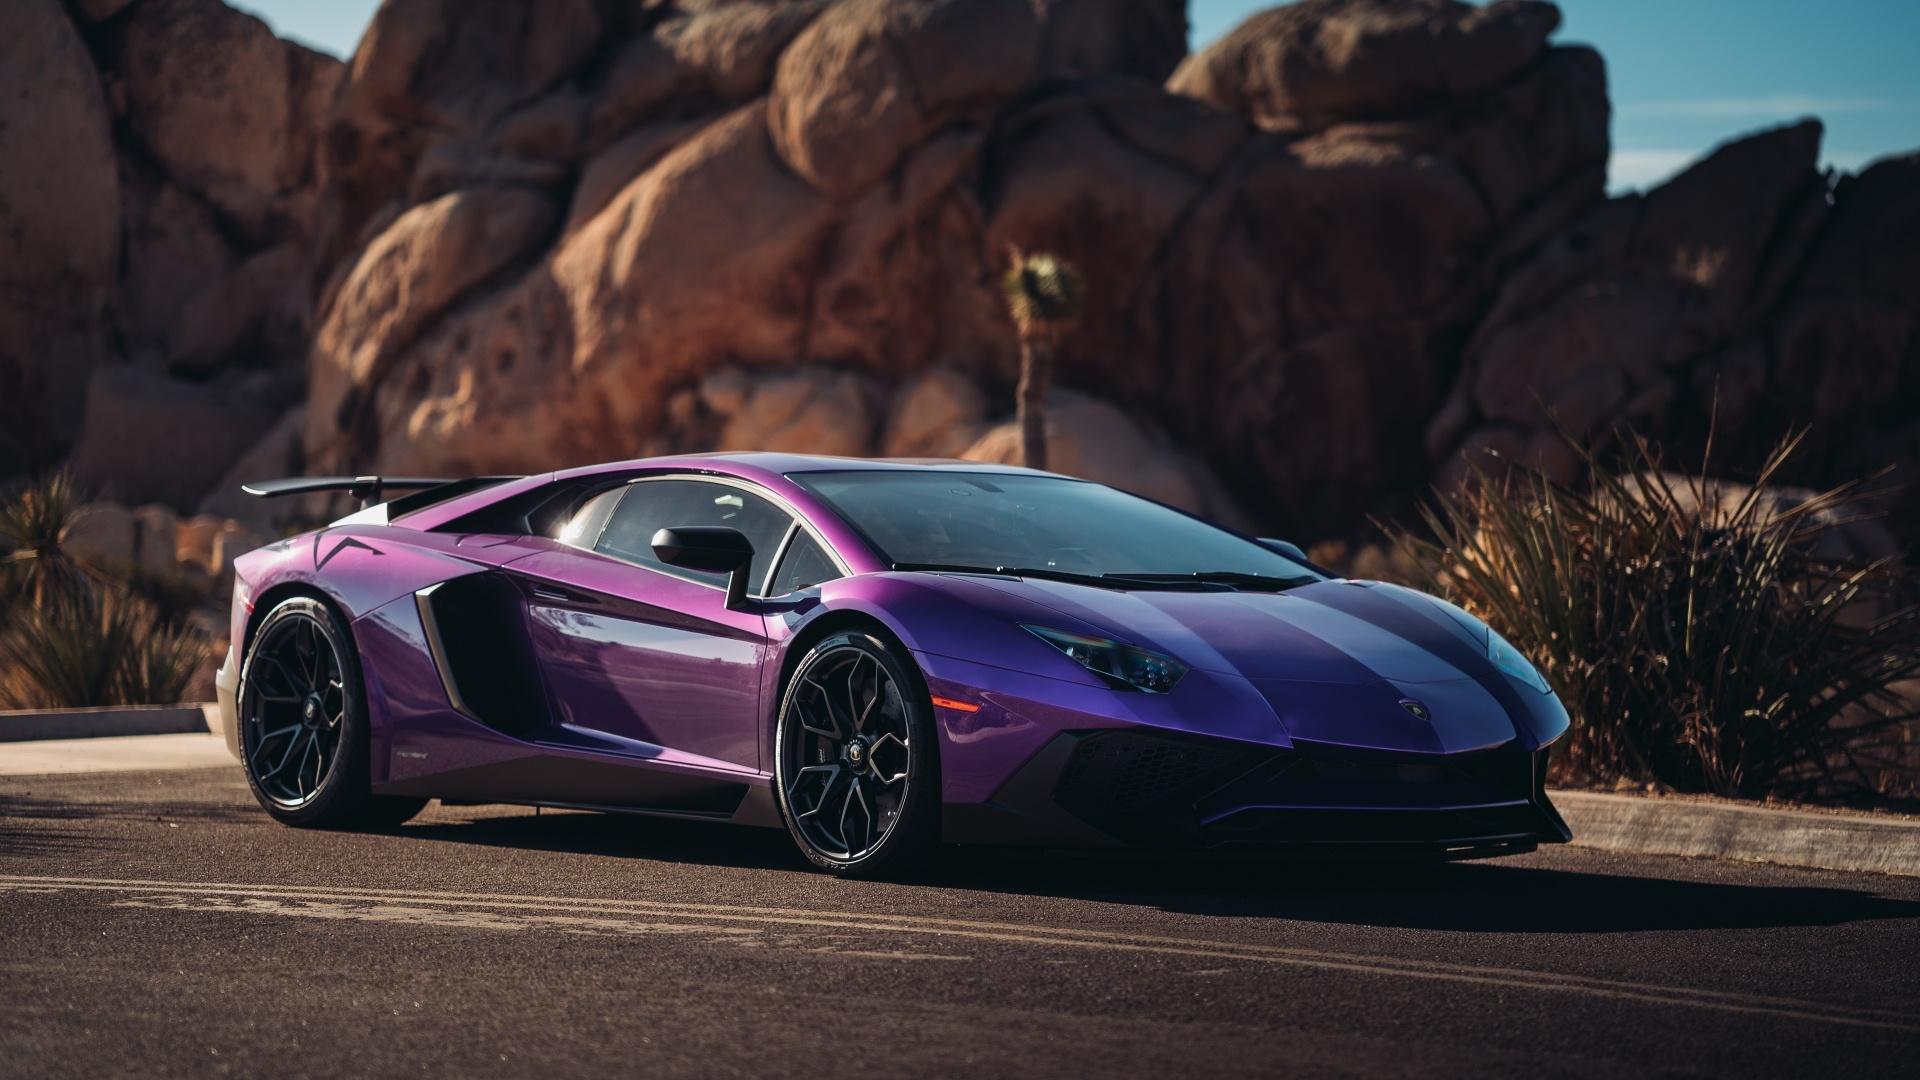 Lamborghini background wallpaper